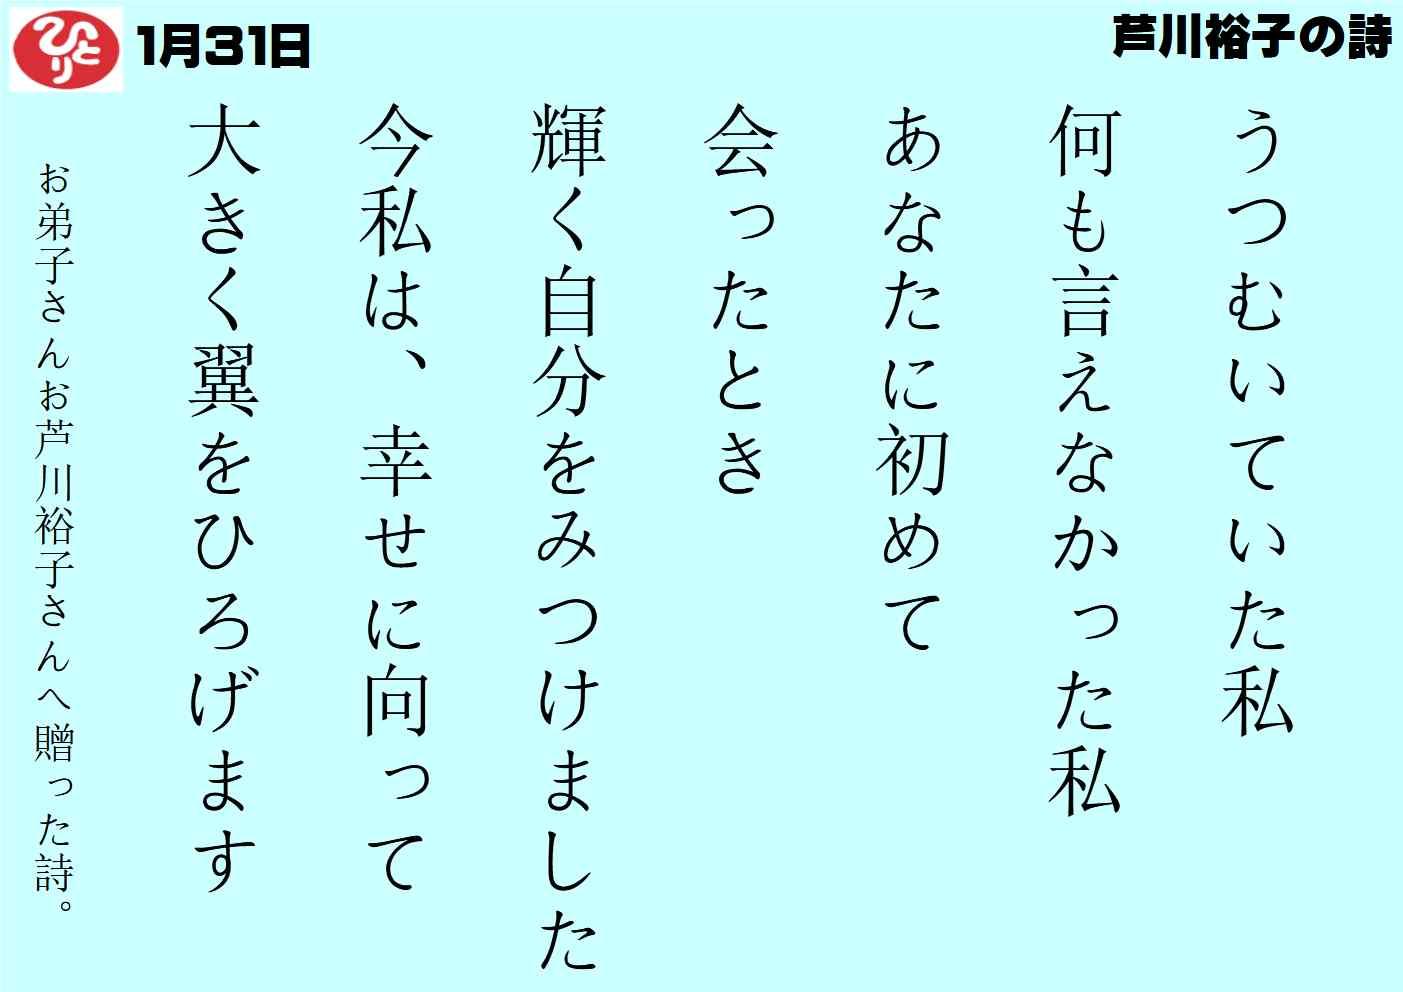 1月31日|芦川裕子の詩|一日一語斎藤一人